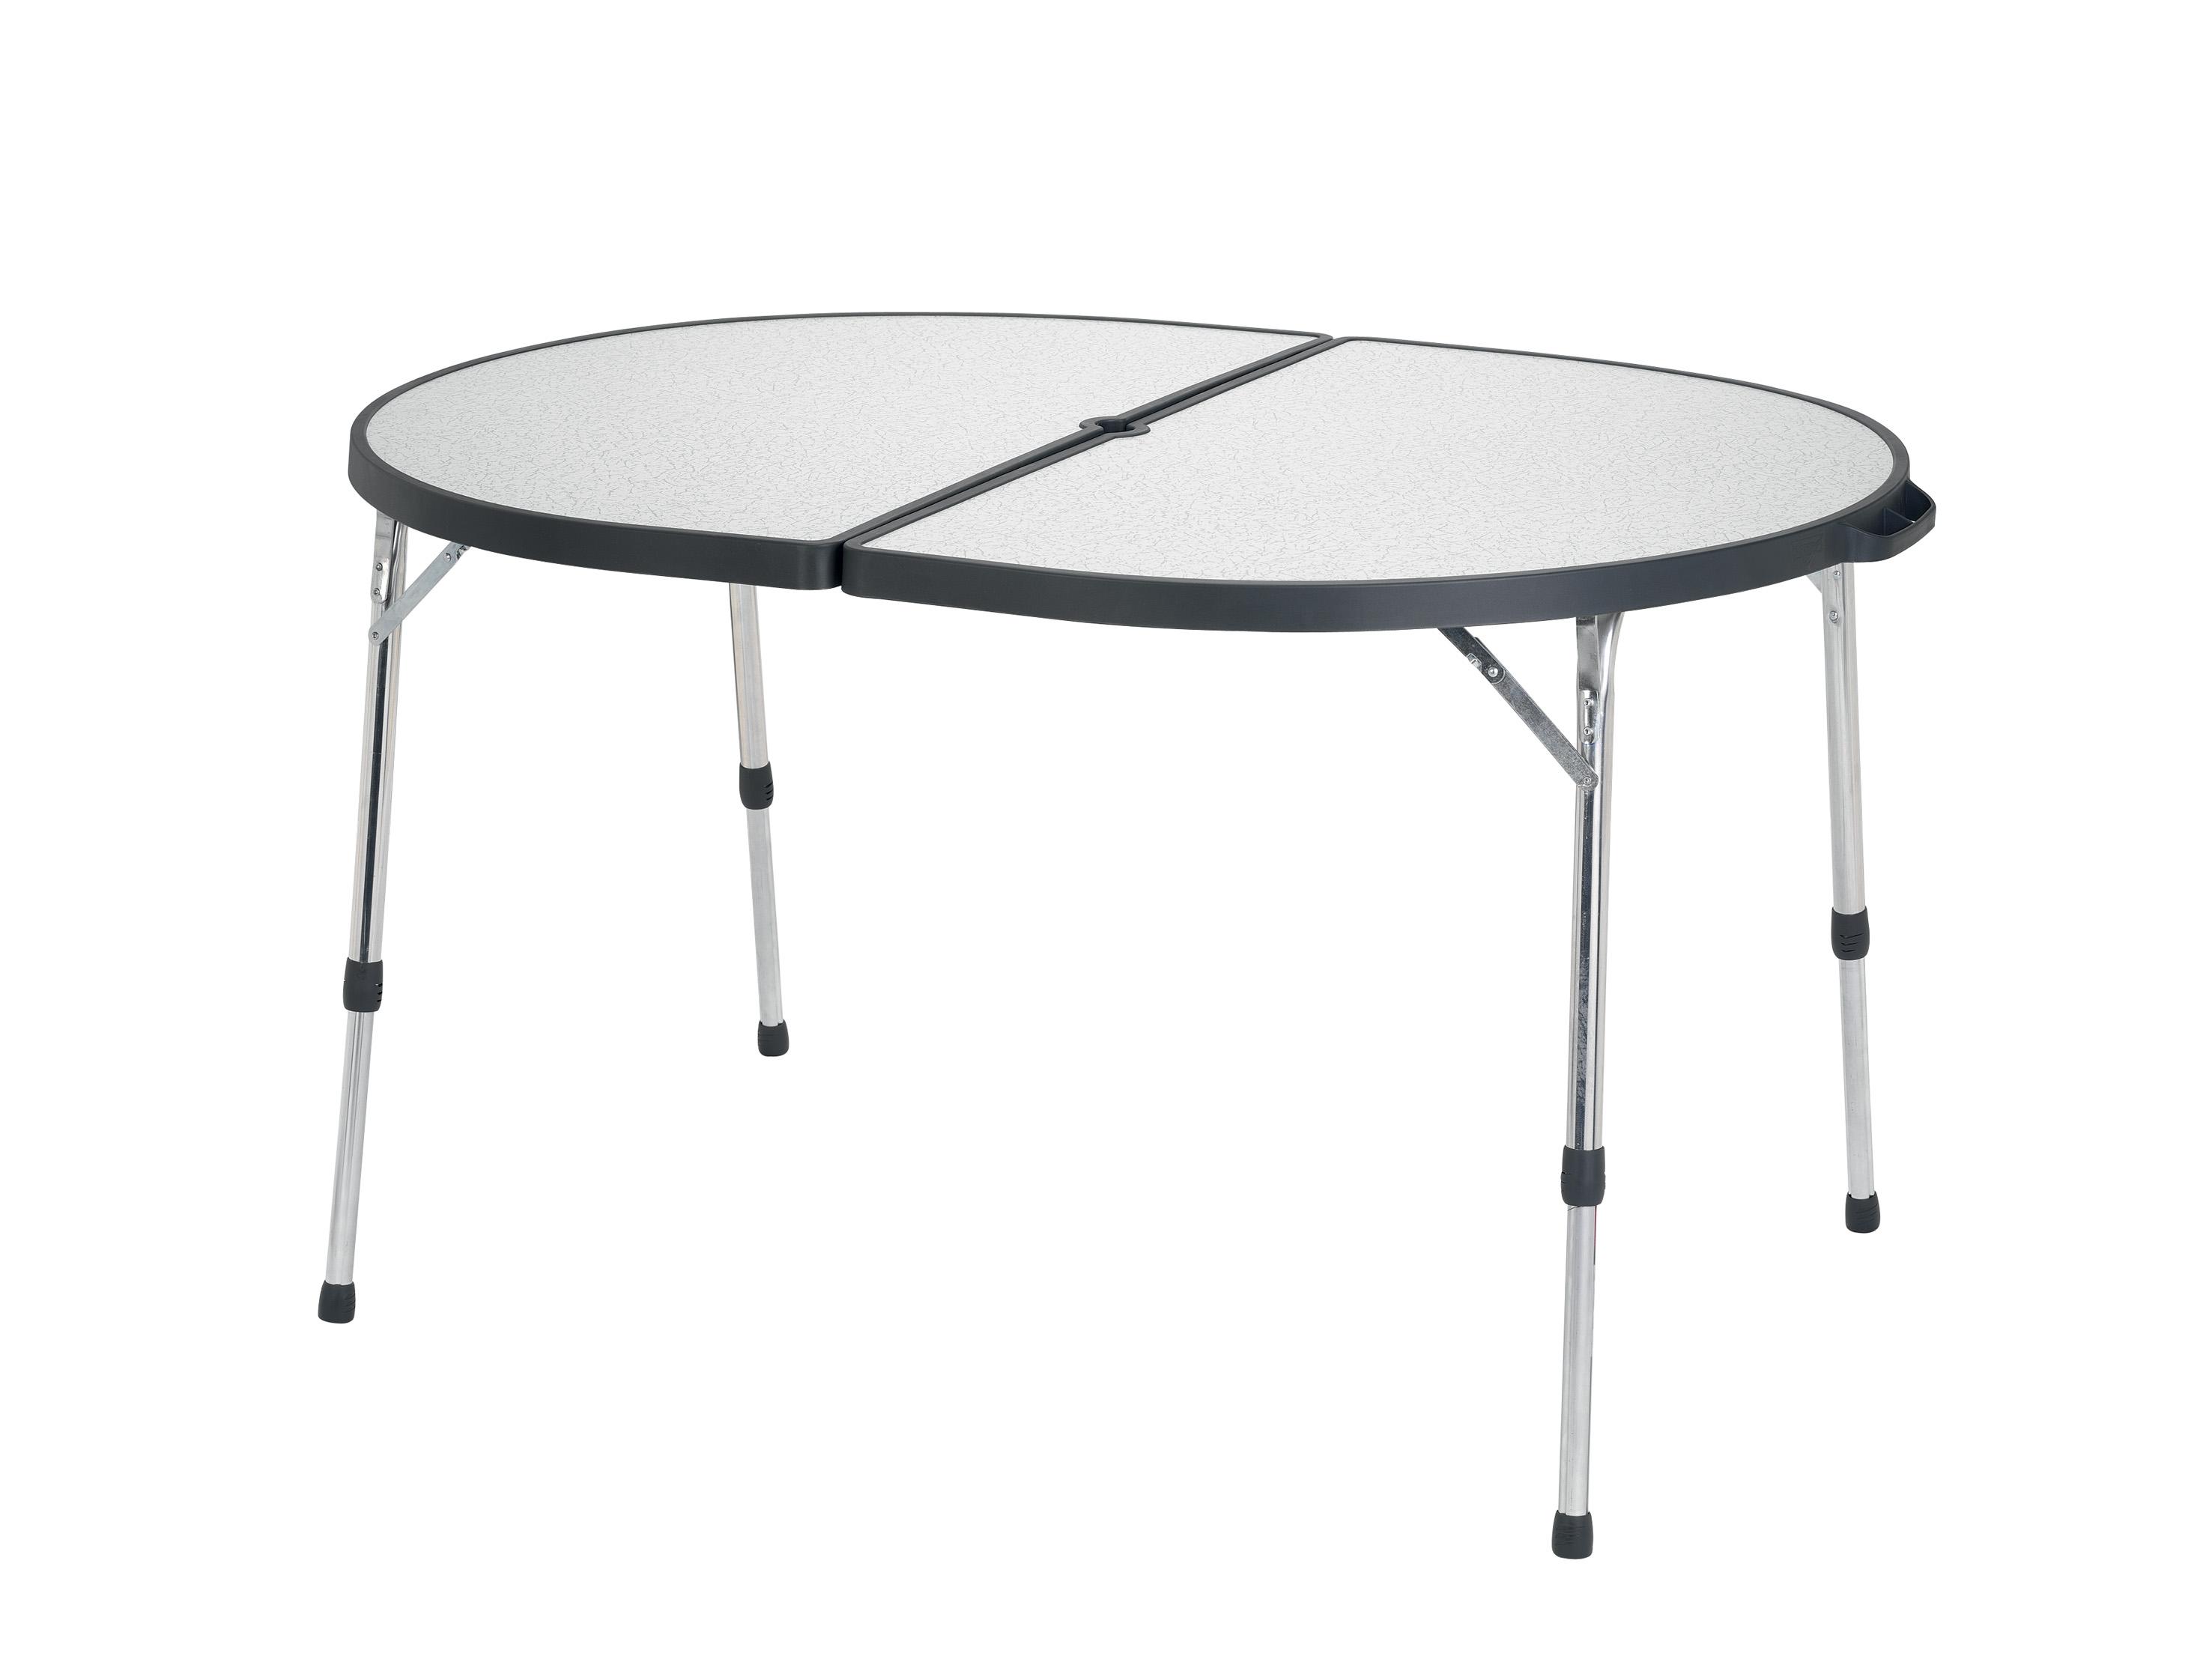 La mesa crespo al 352 ha sido declarada la mejor mesa de for Mesas de camping plegables baratas